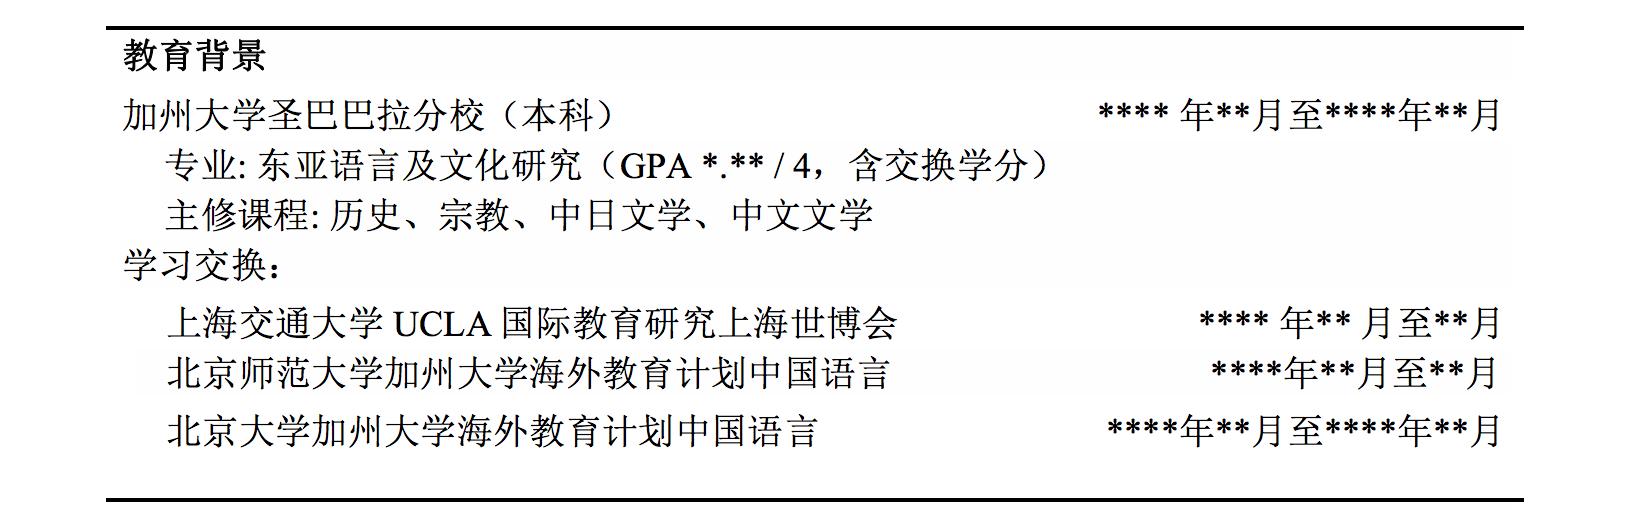 chinese resume samples